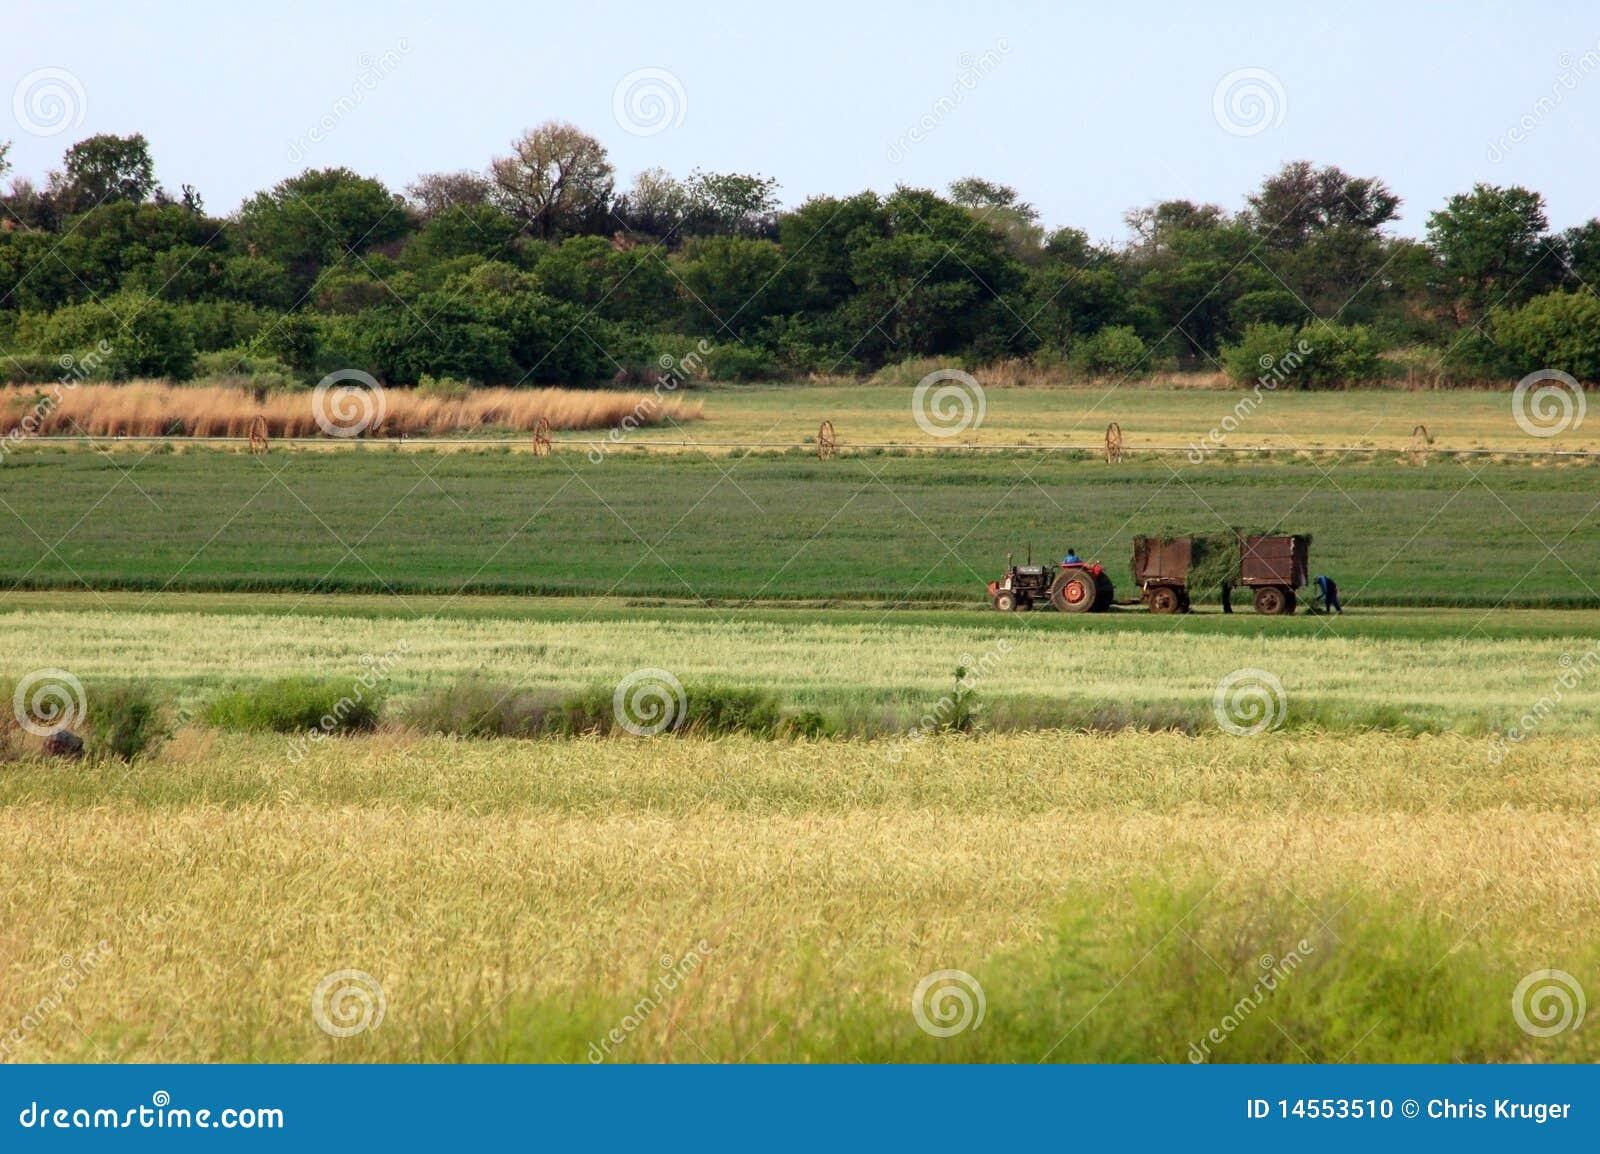 Farmer in Africa